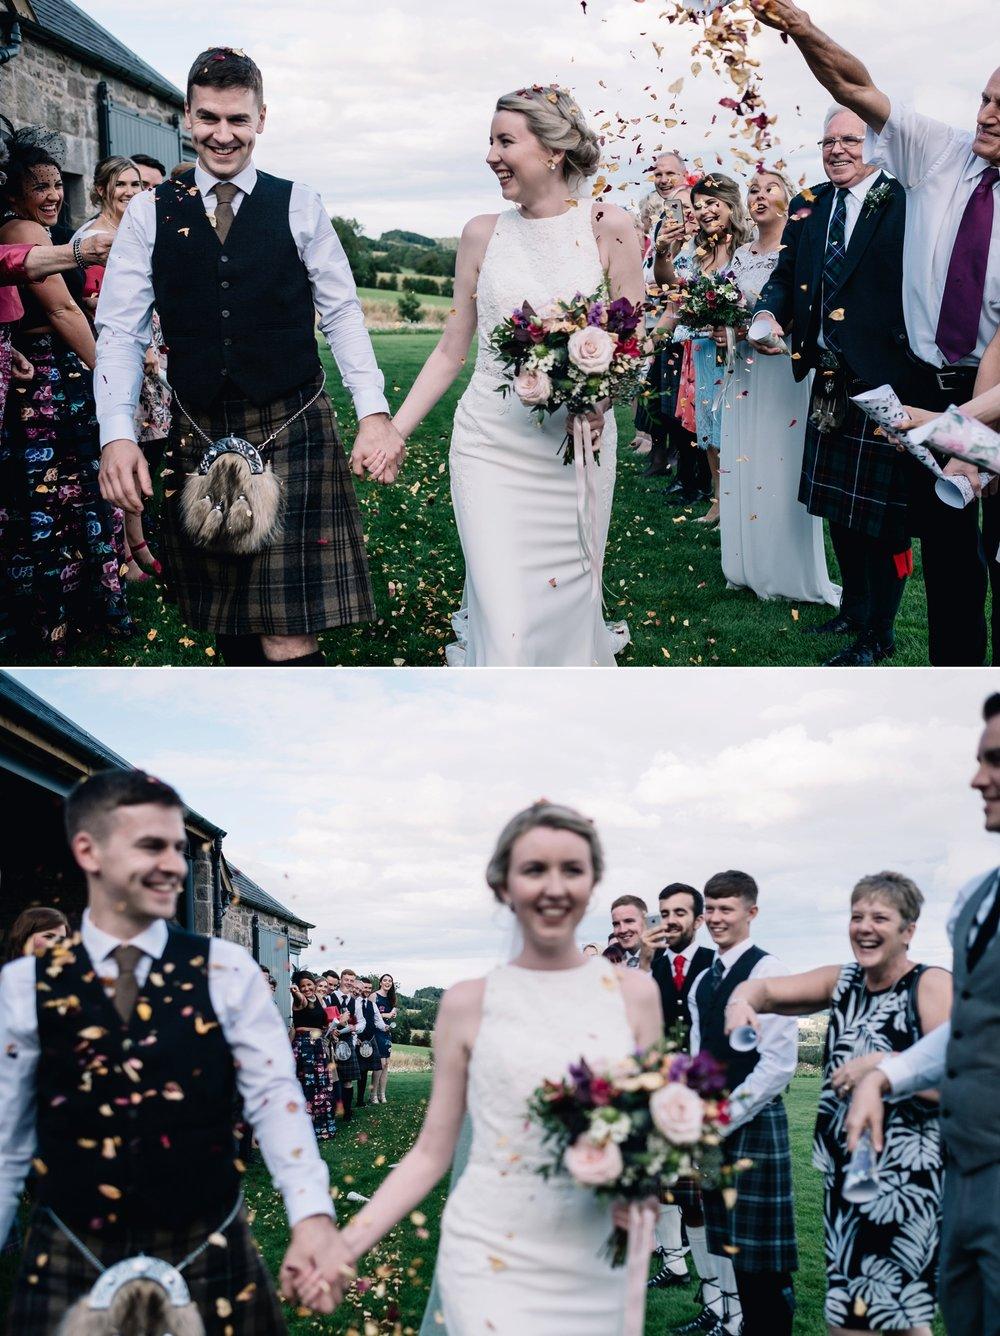 462-Rebeca-Tom-Wedding-Guardswell.JPG